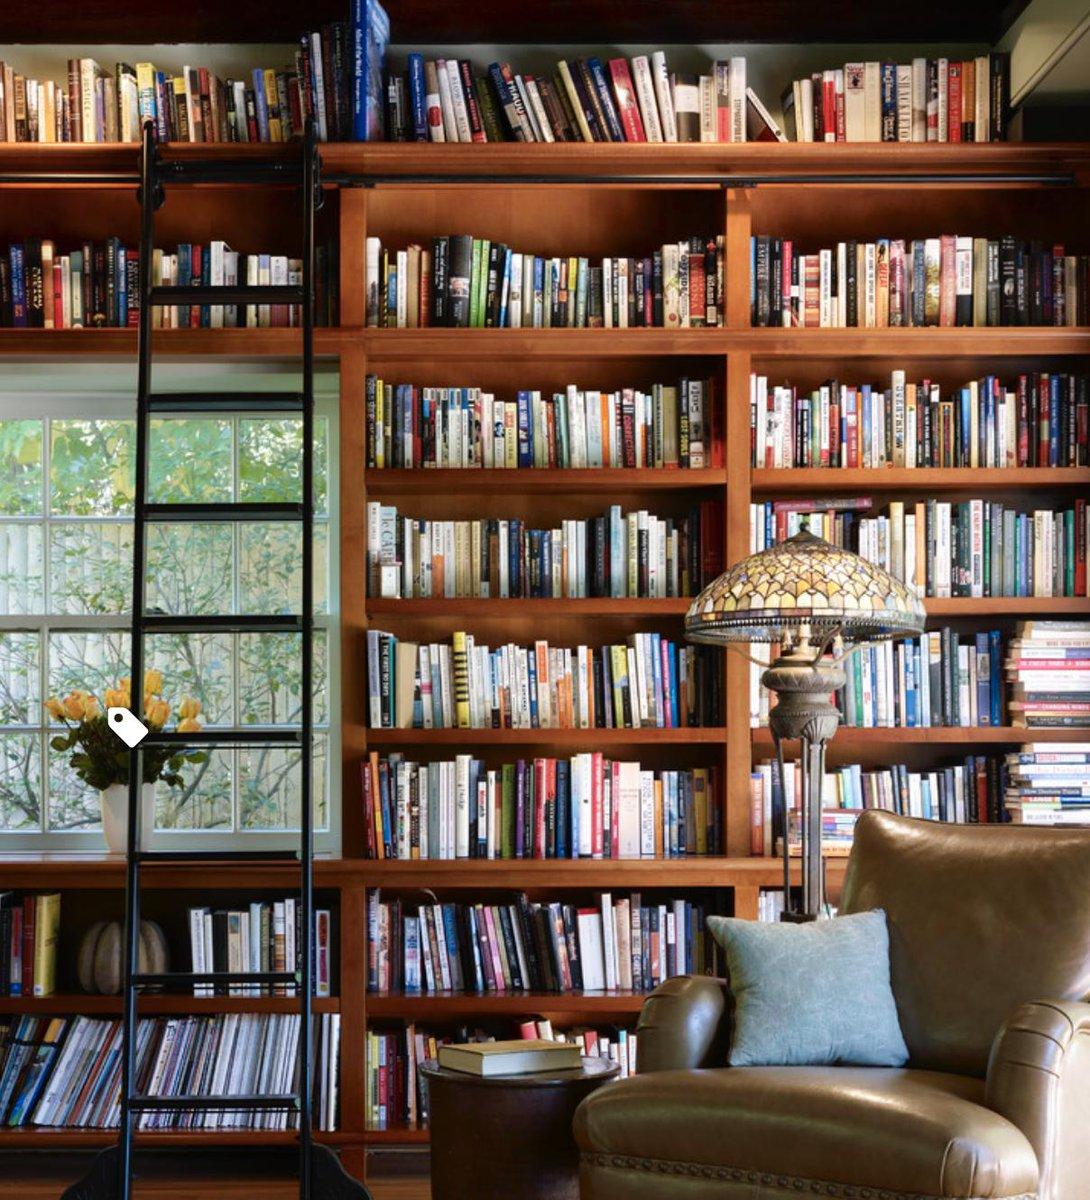 Home library perfection ... 😊💗  #art #travel #socialmedia